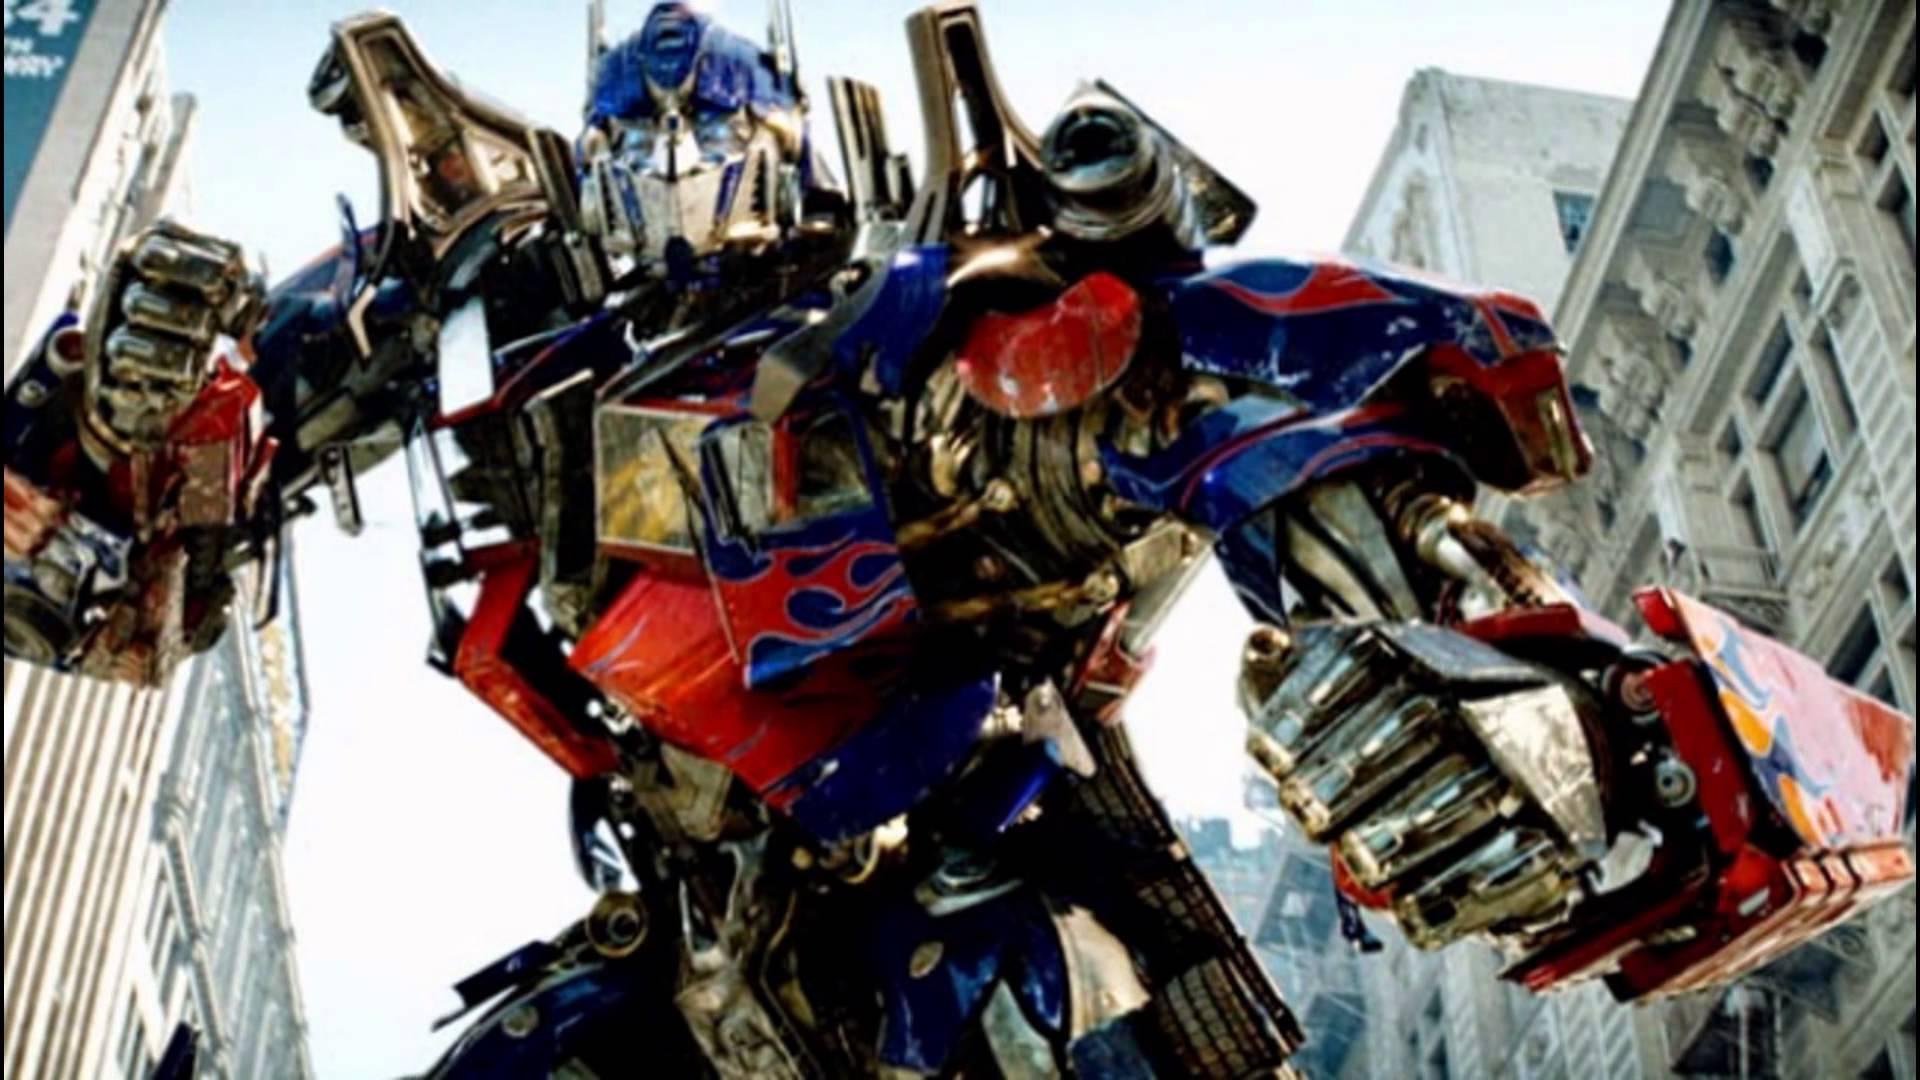 Wonderful Transformers Wallpaper